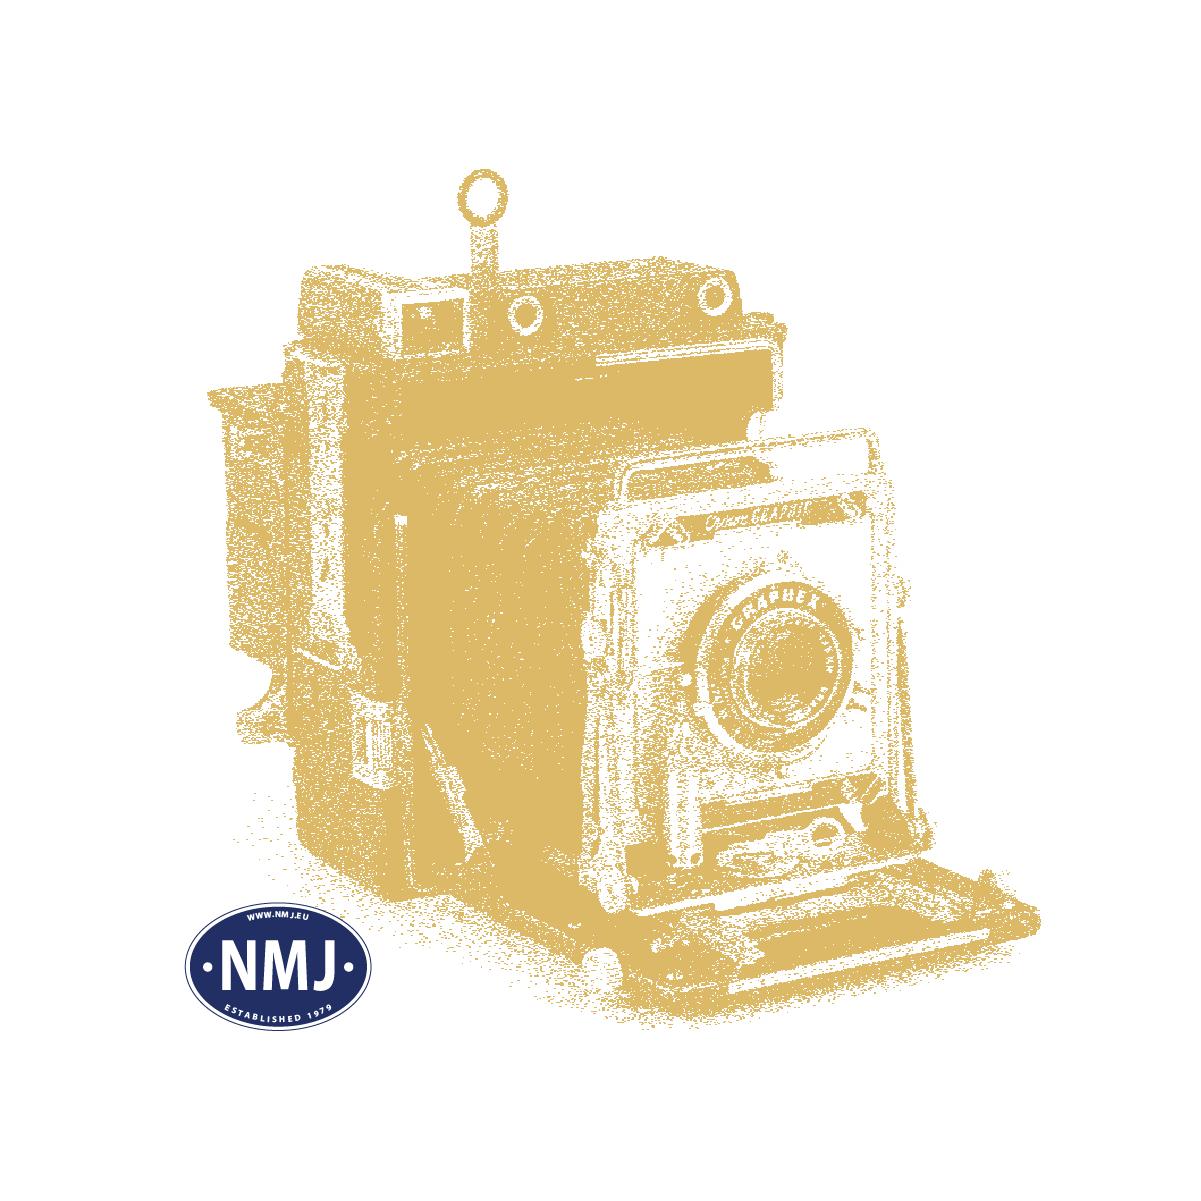 NMJT90006 - NMJ Topline NSB Diesellok Di3a 608, Gammeldesign, DC